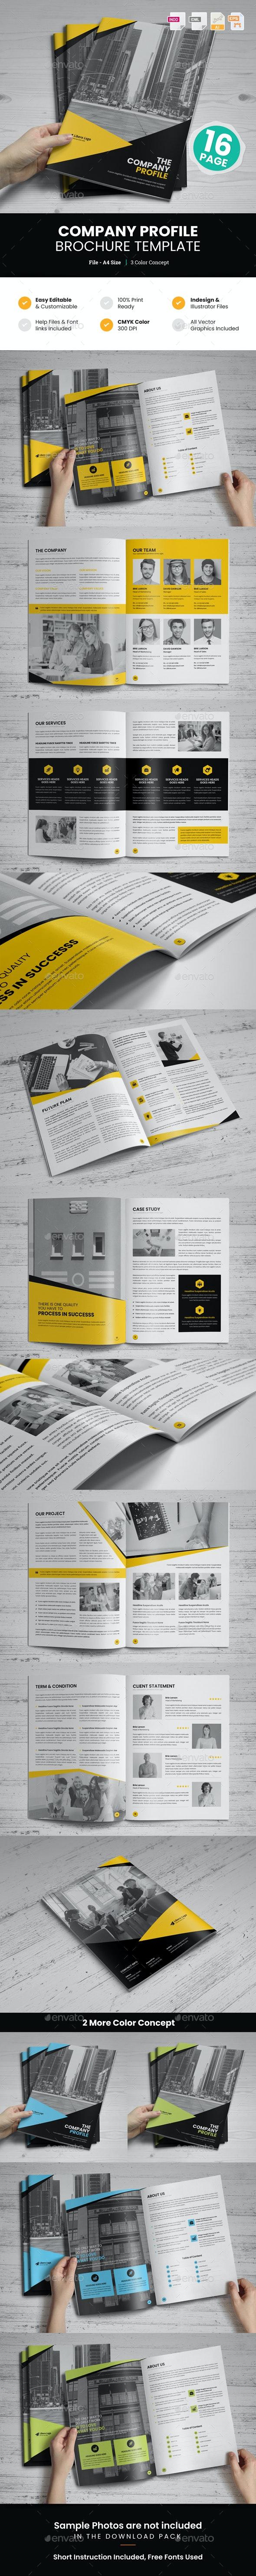 Company Profile Brochure Design v9 - Corporate Brochures